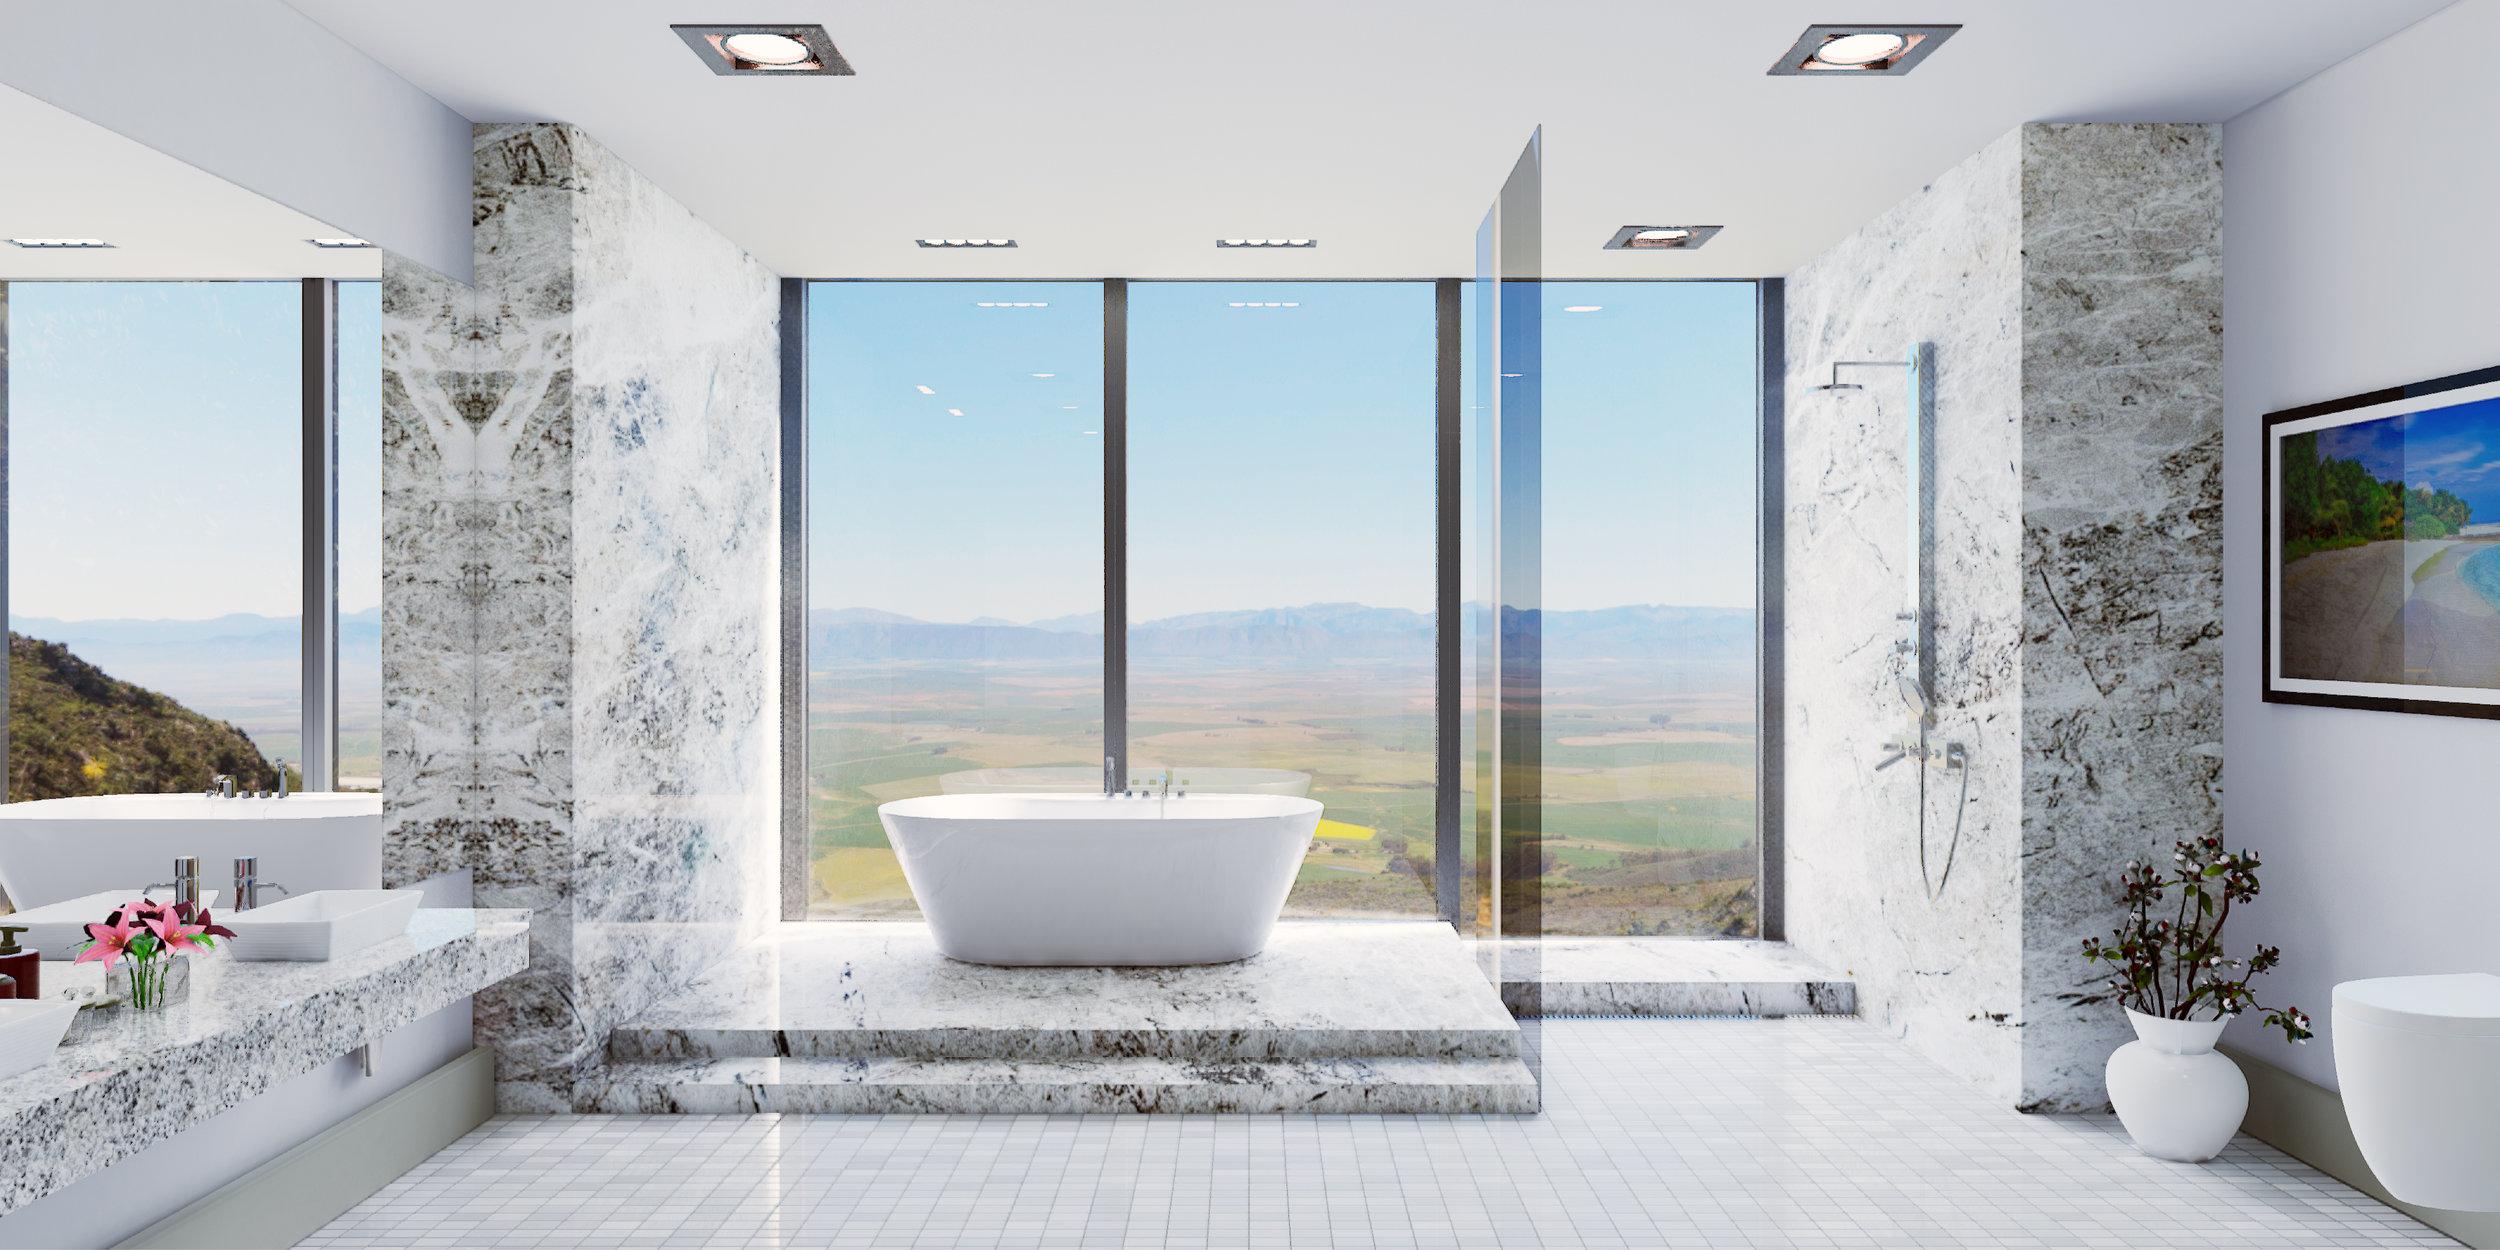 Bathroom_0001.jpg